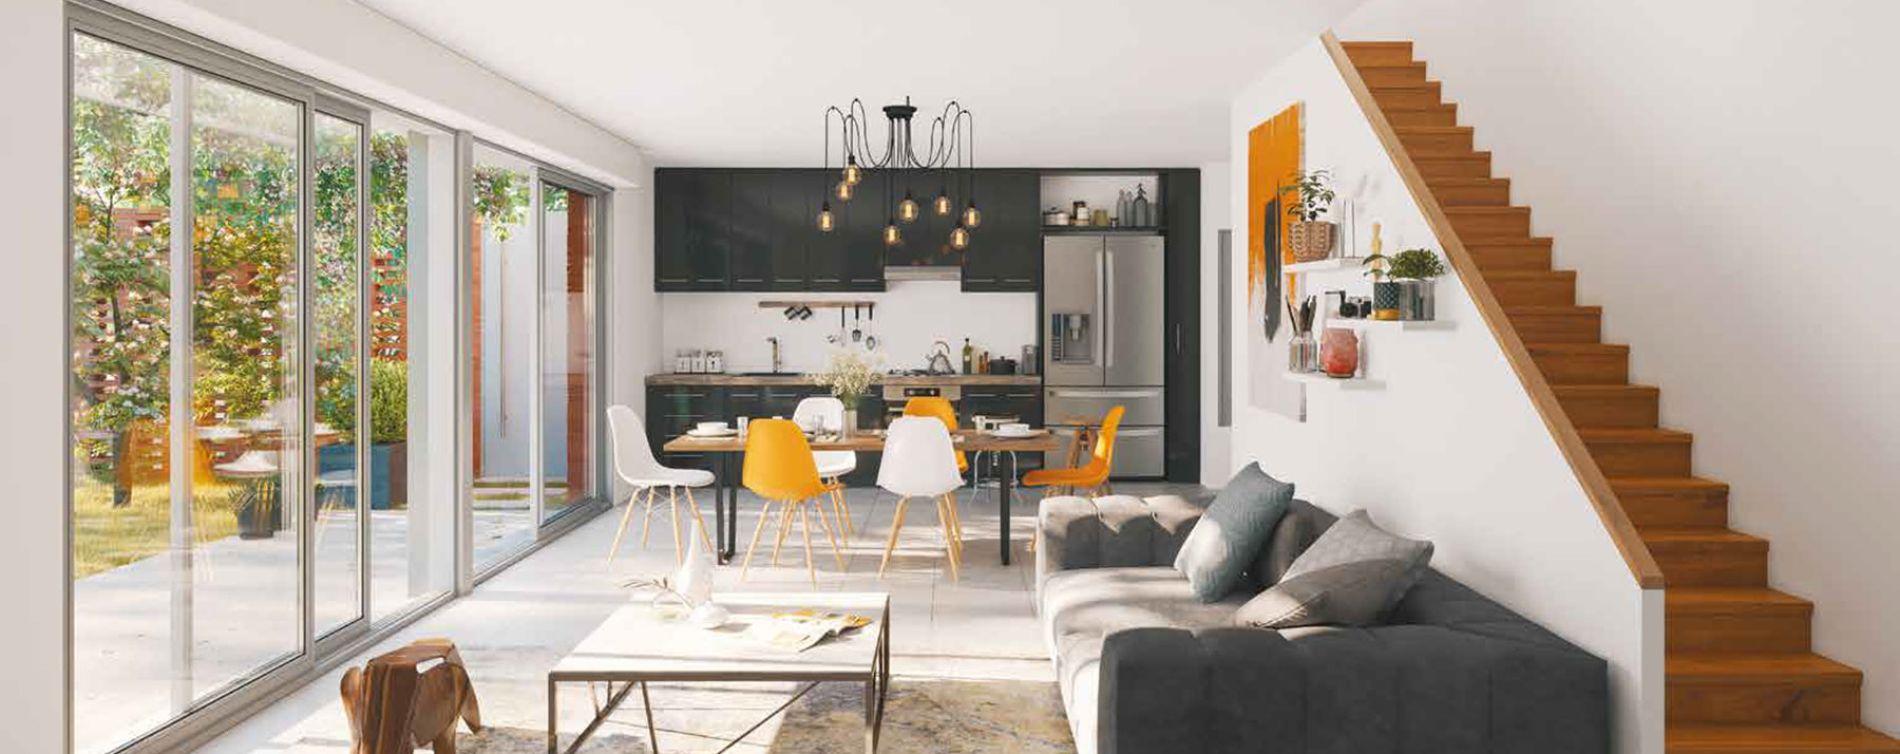 Beauzelle : programme immobilier neuve « Poppy » (4)